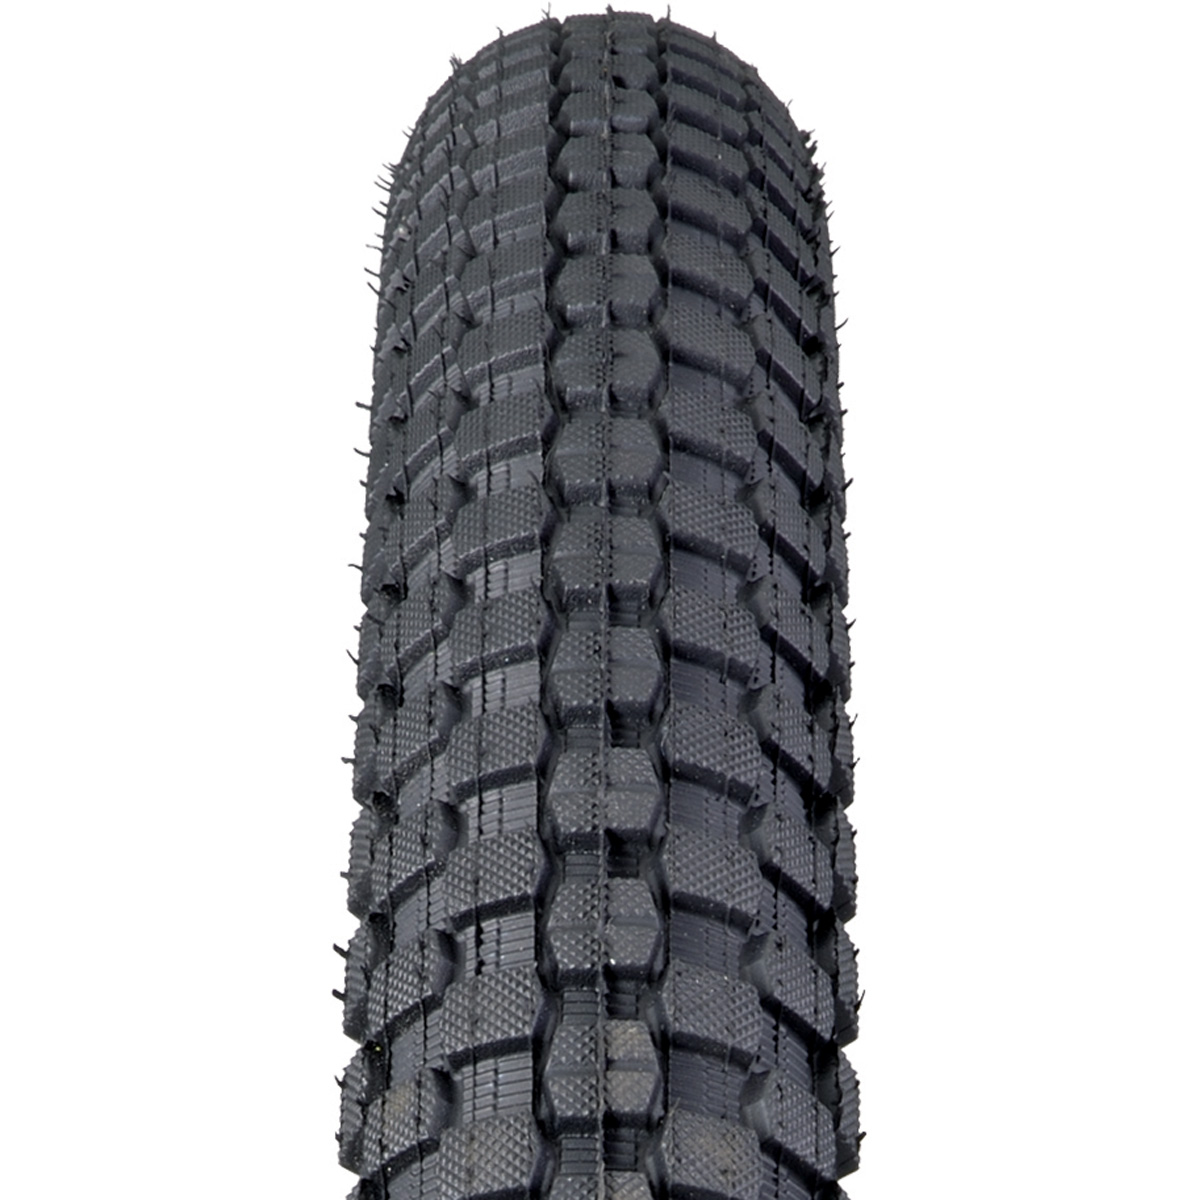 Kenda K-Rad K905 Wire Bead Mountain Bicycle Tire - 26 x 1.95